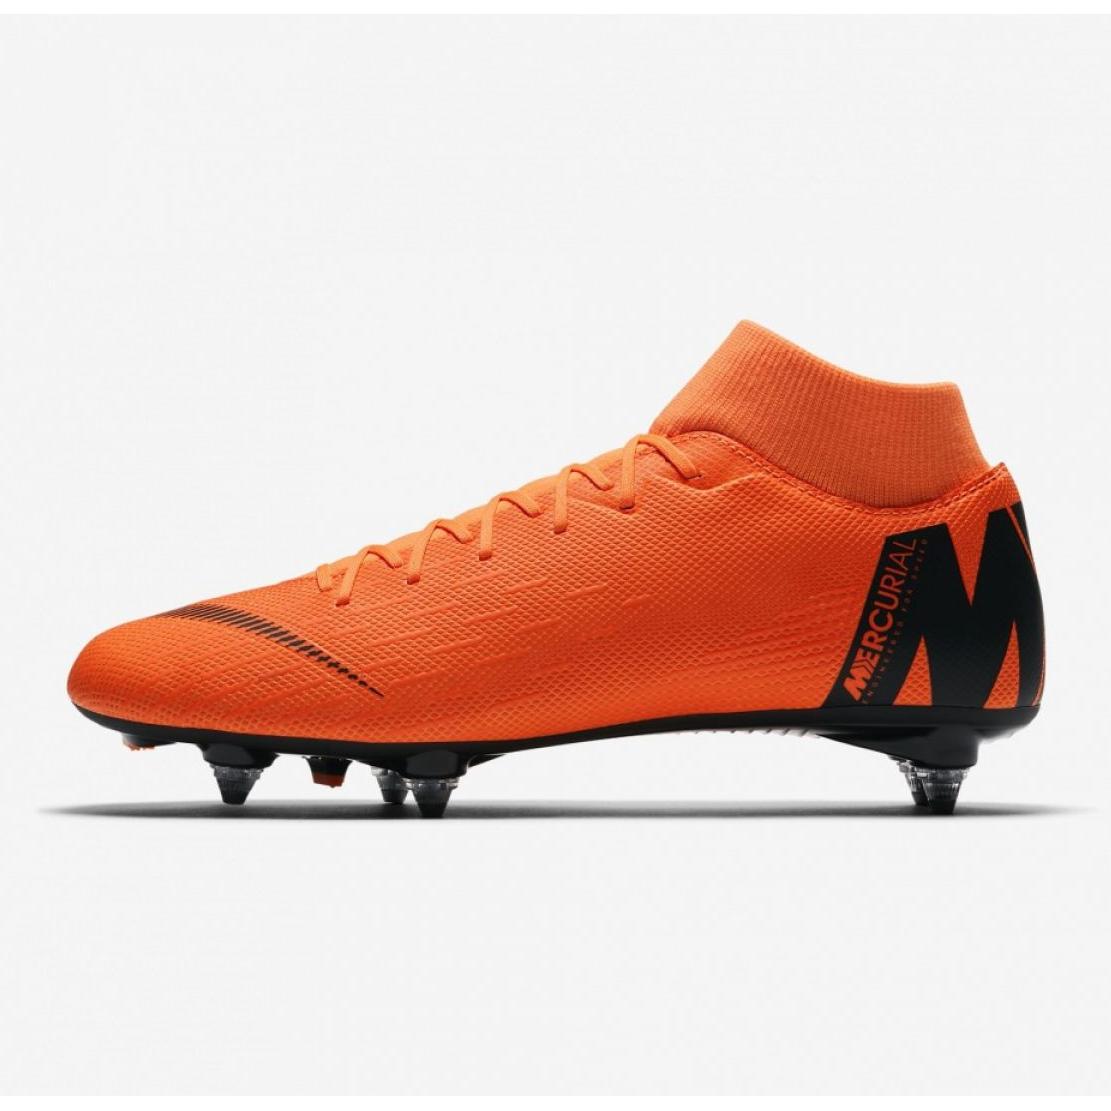 best website 05a48 e33a9 Nike Mercurial Superfly 6 Academy Sg Pro M AH7364-810 Football Shoes